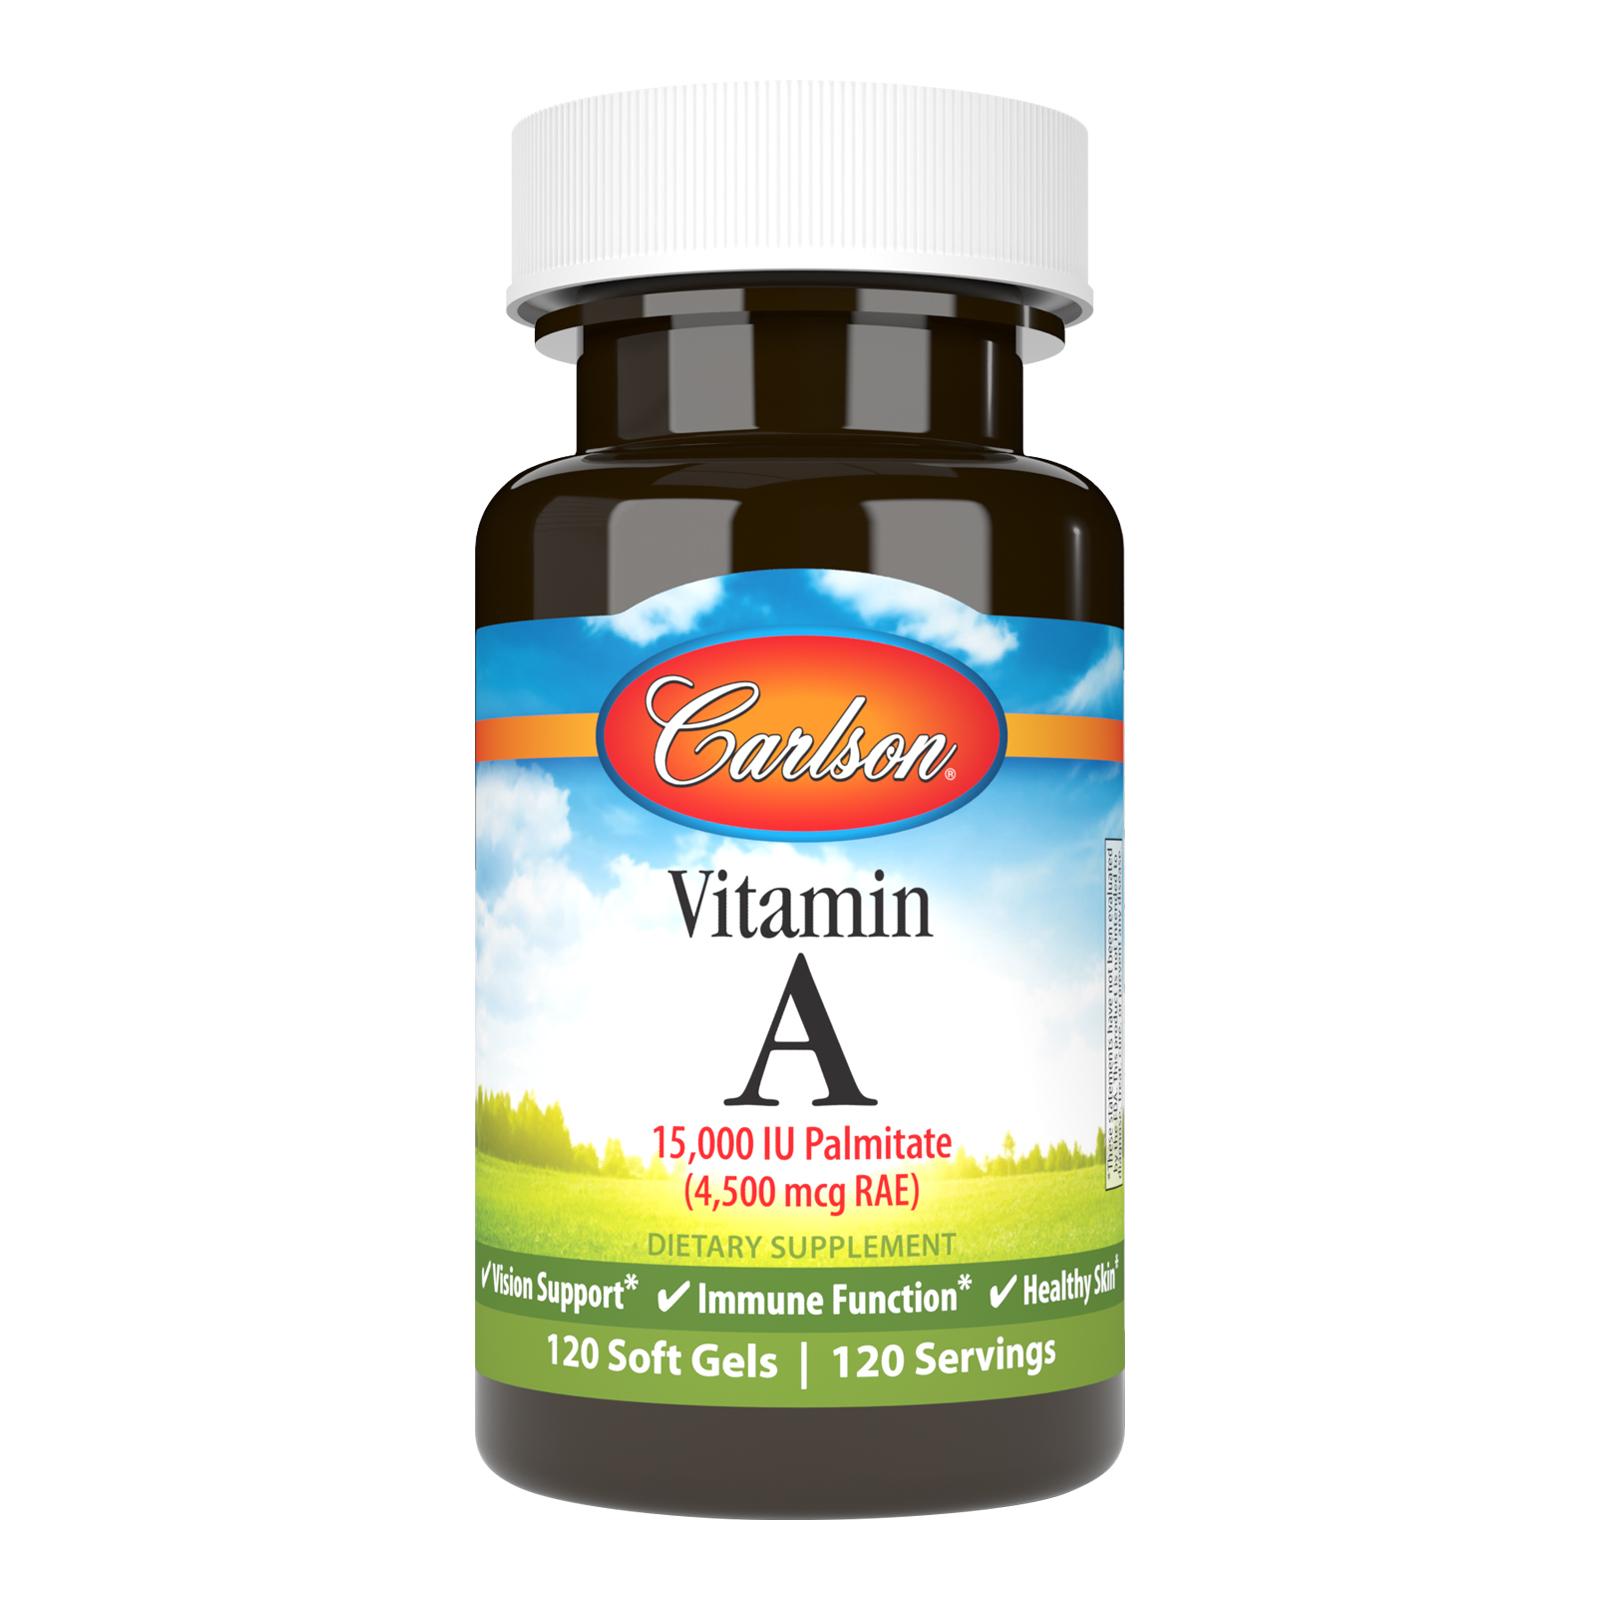 Vitamin A Palmitate 15,000 IU (4,500 mcg RAE)